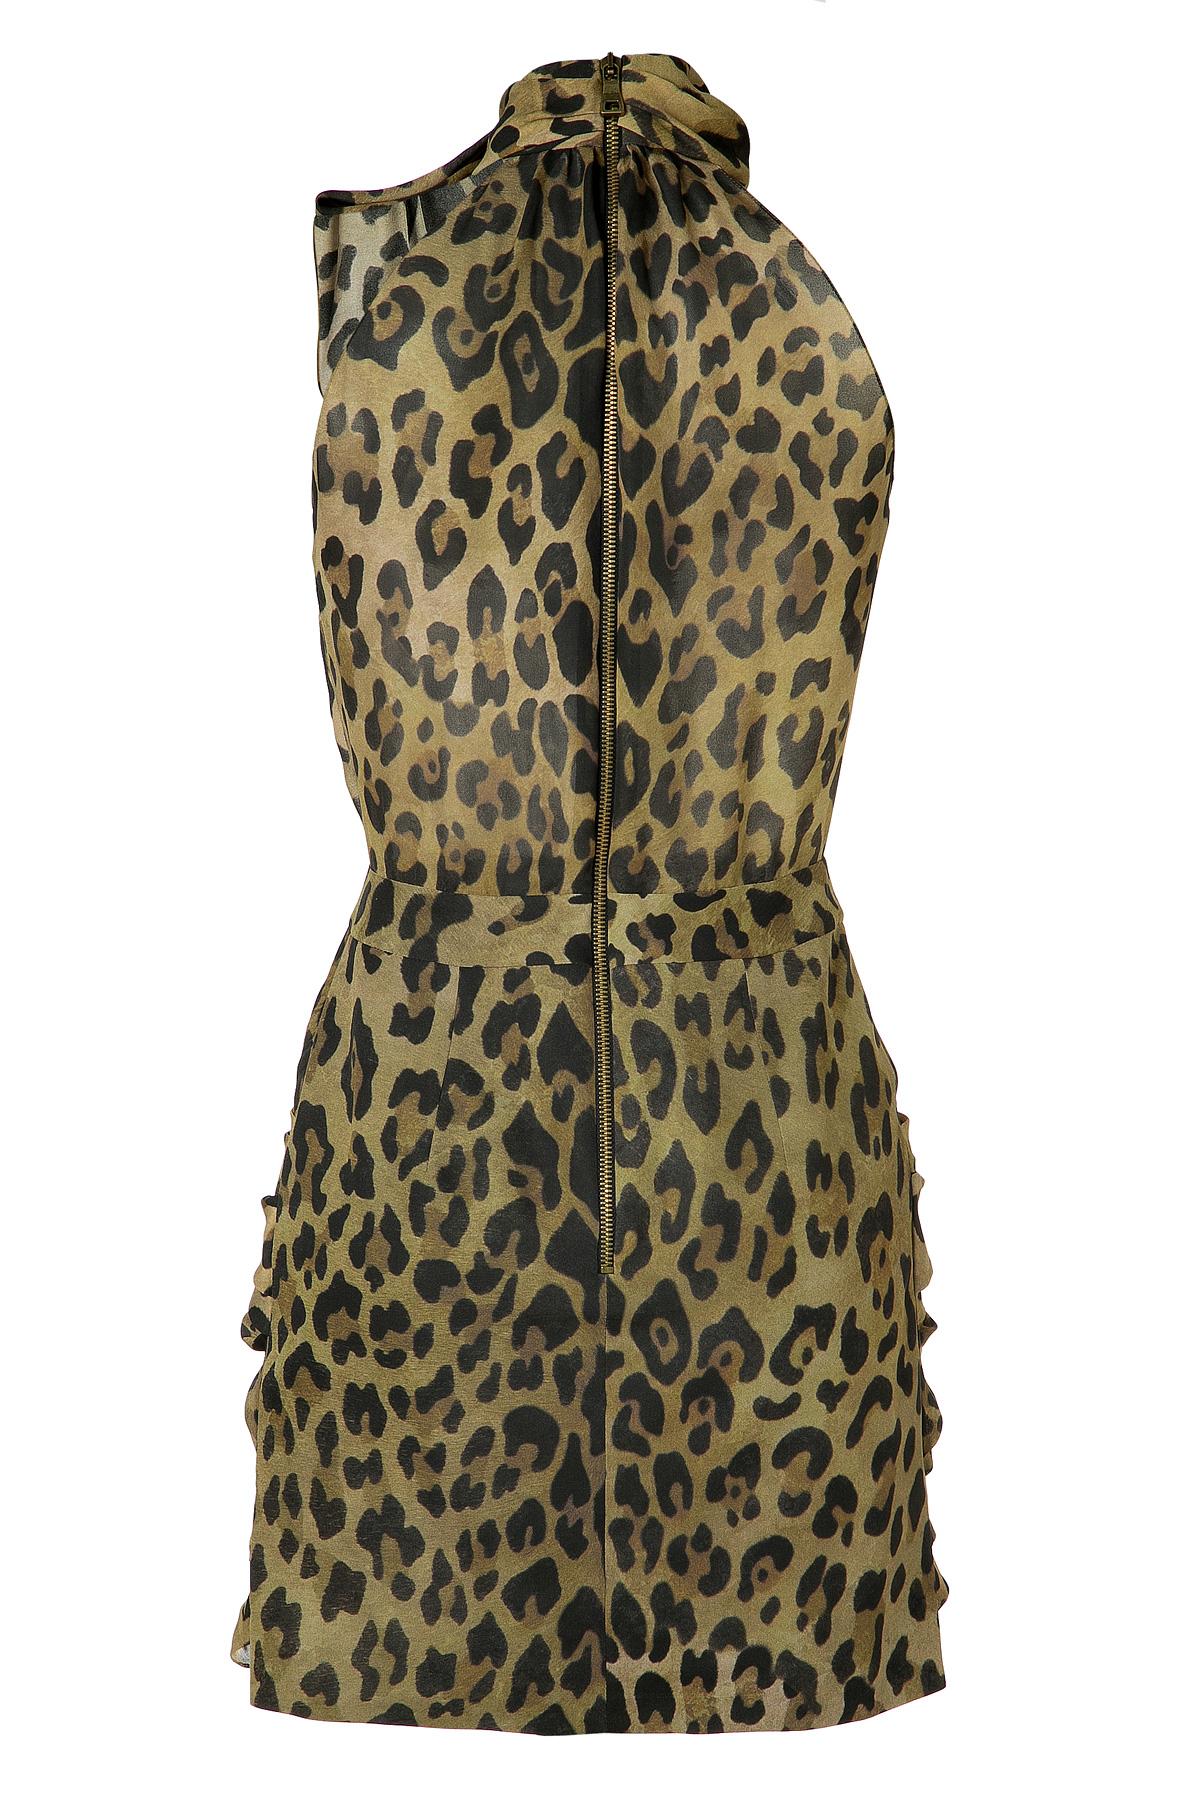 Balmain Silk Leopard Print Cocktail Dress - Lyst